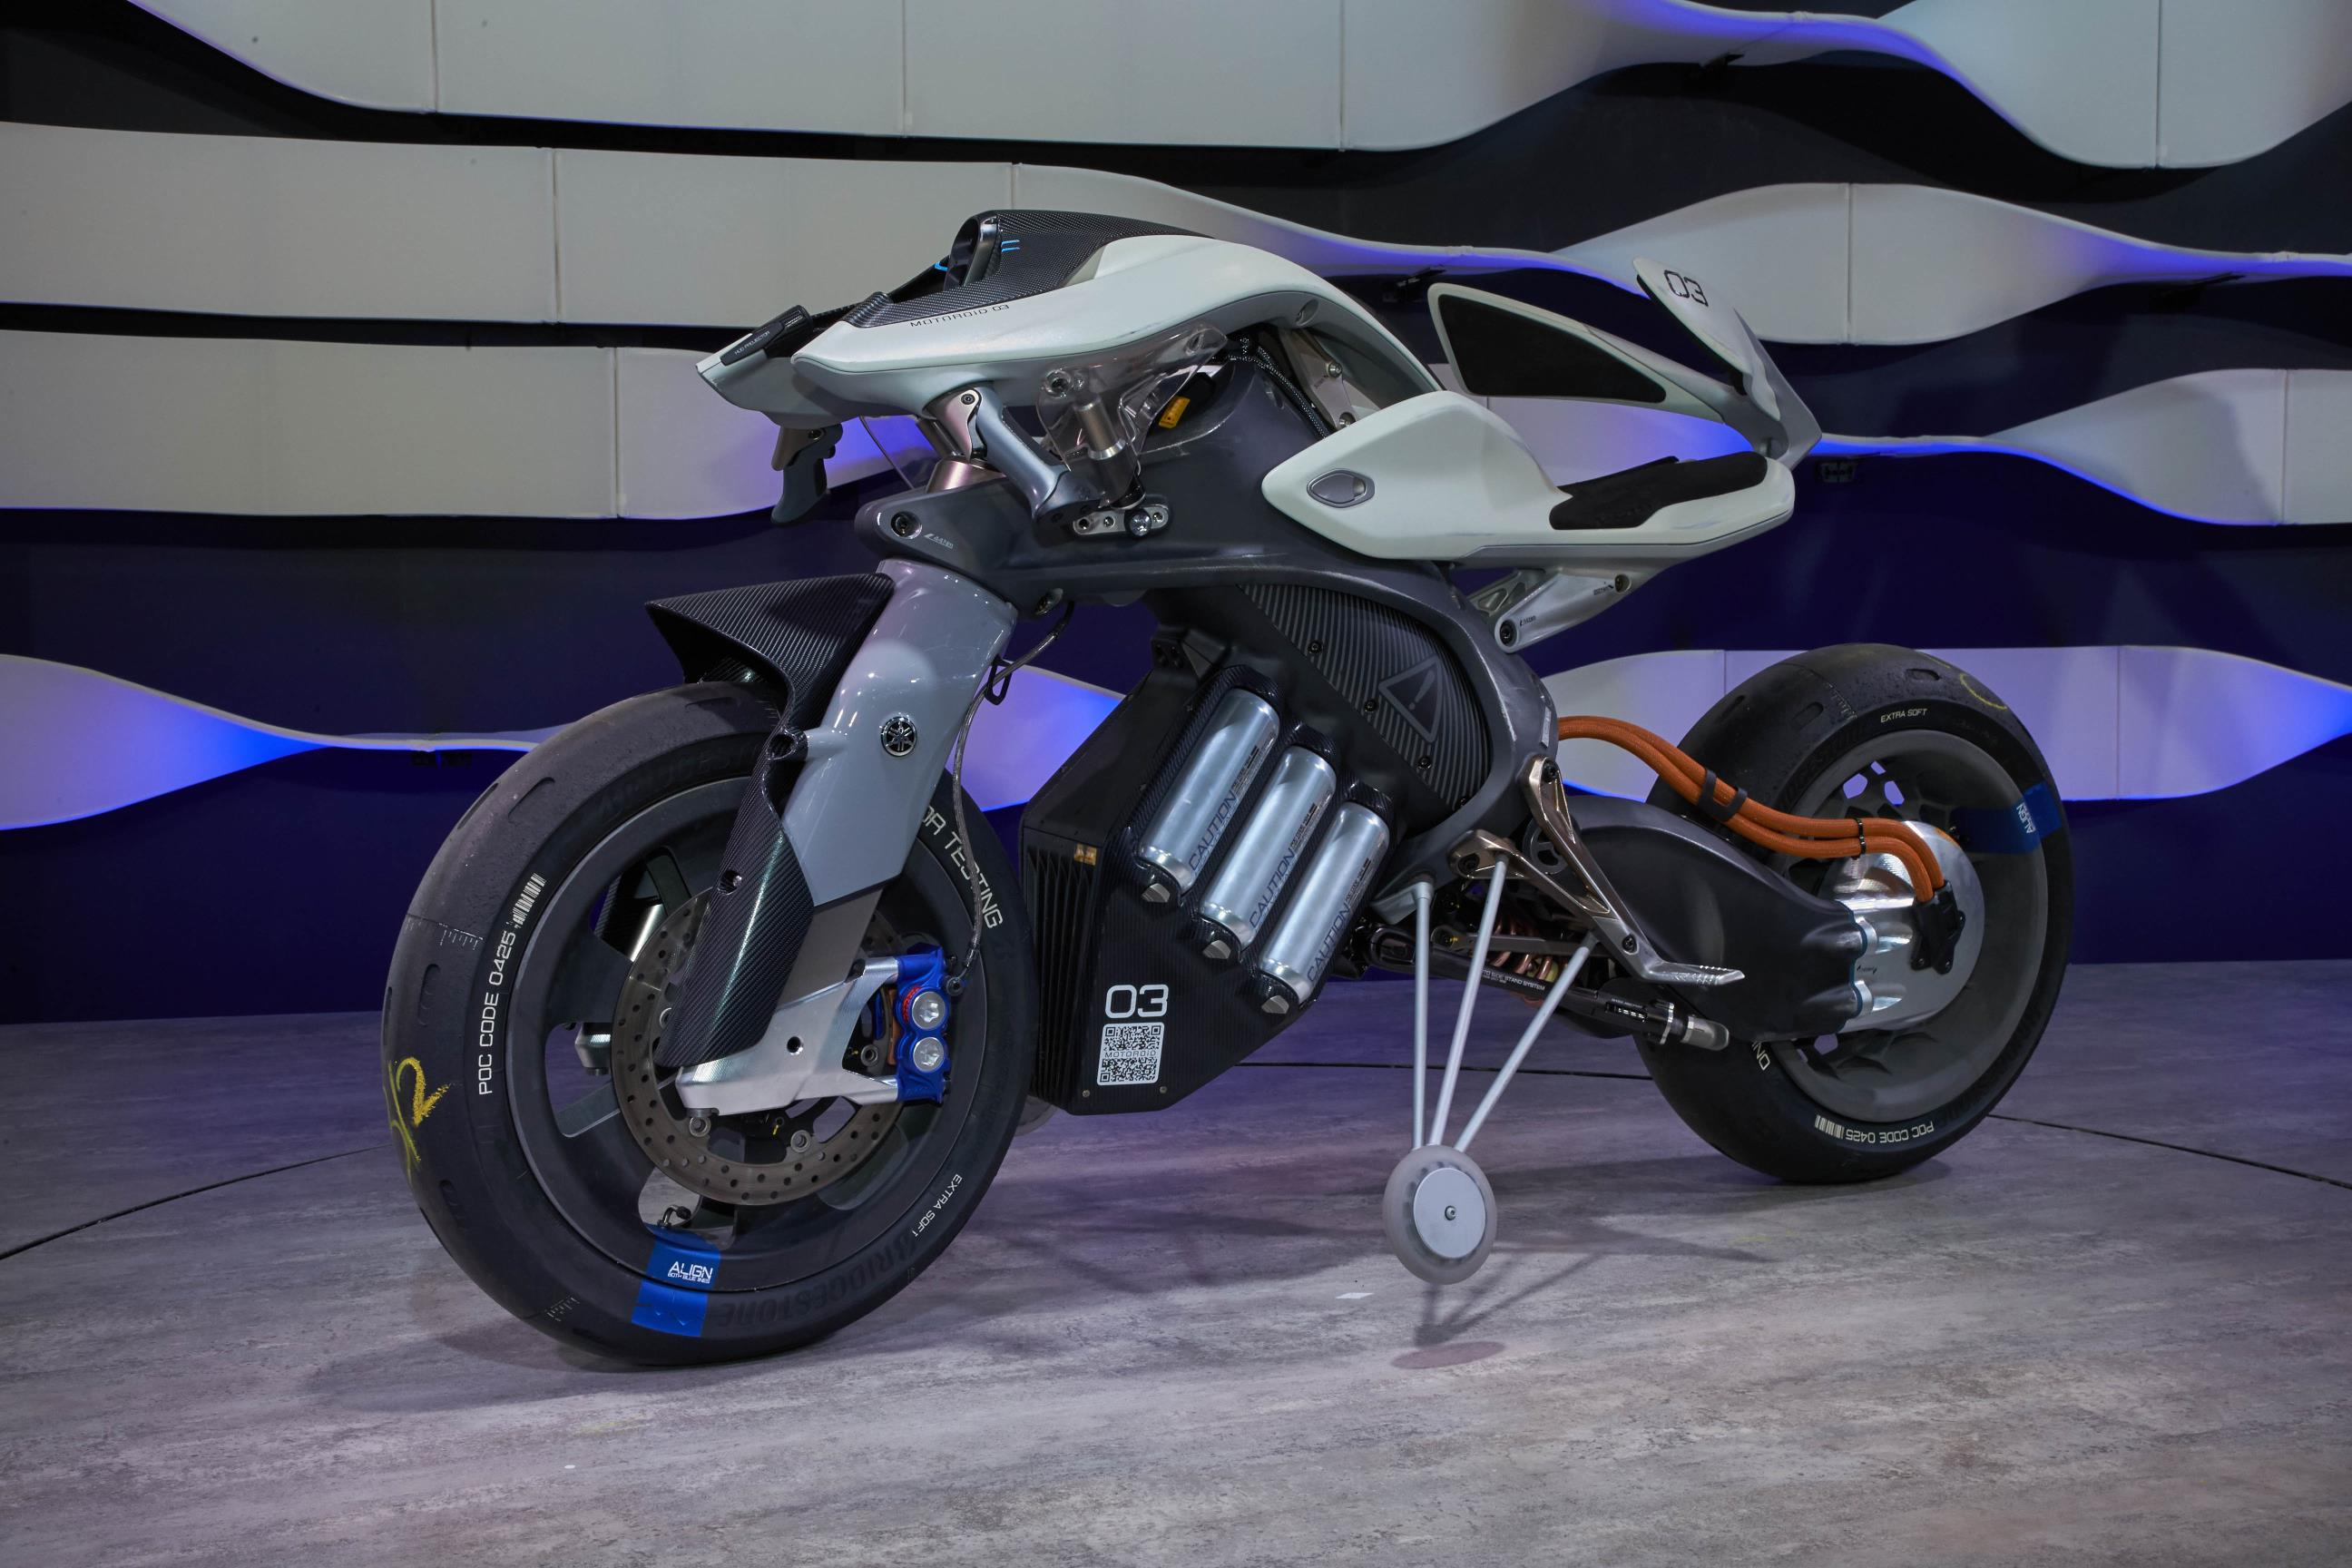 Tokyo motor show 2017 (285)